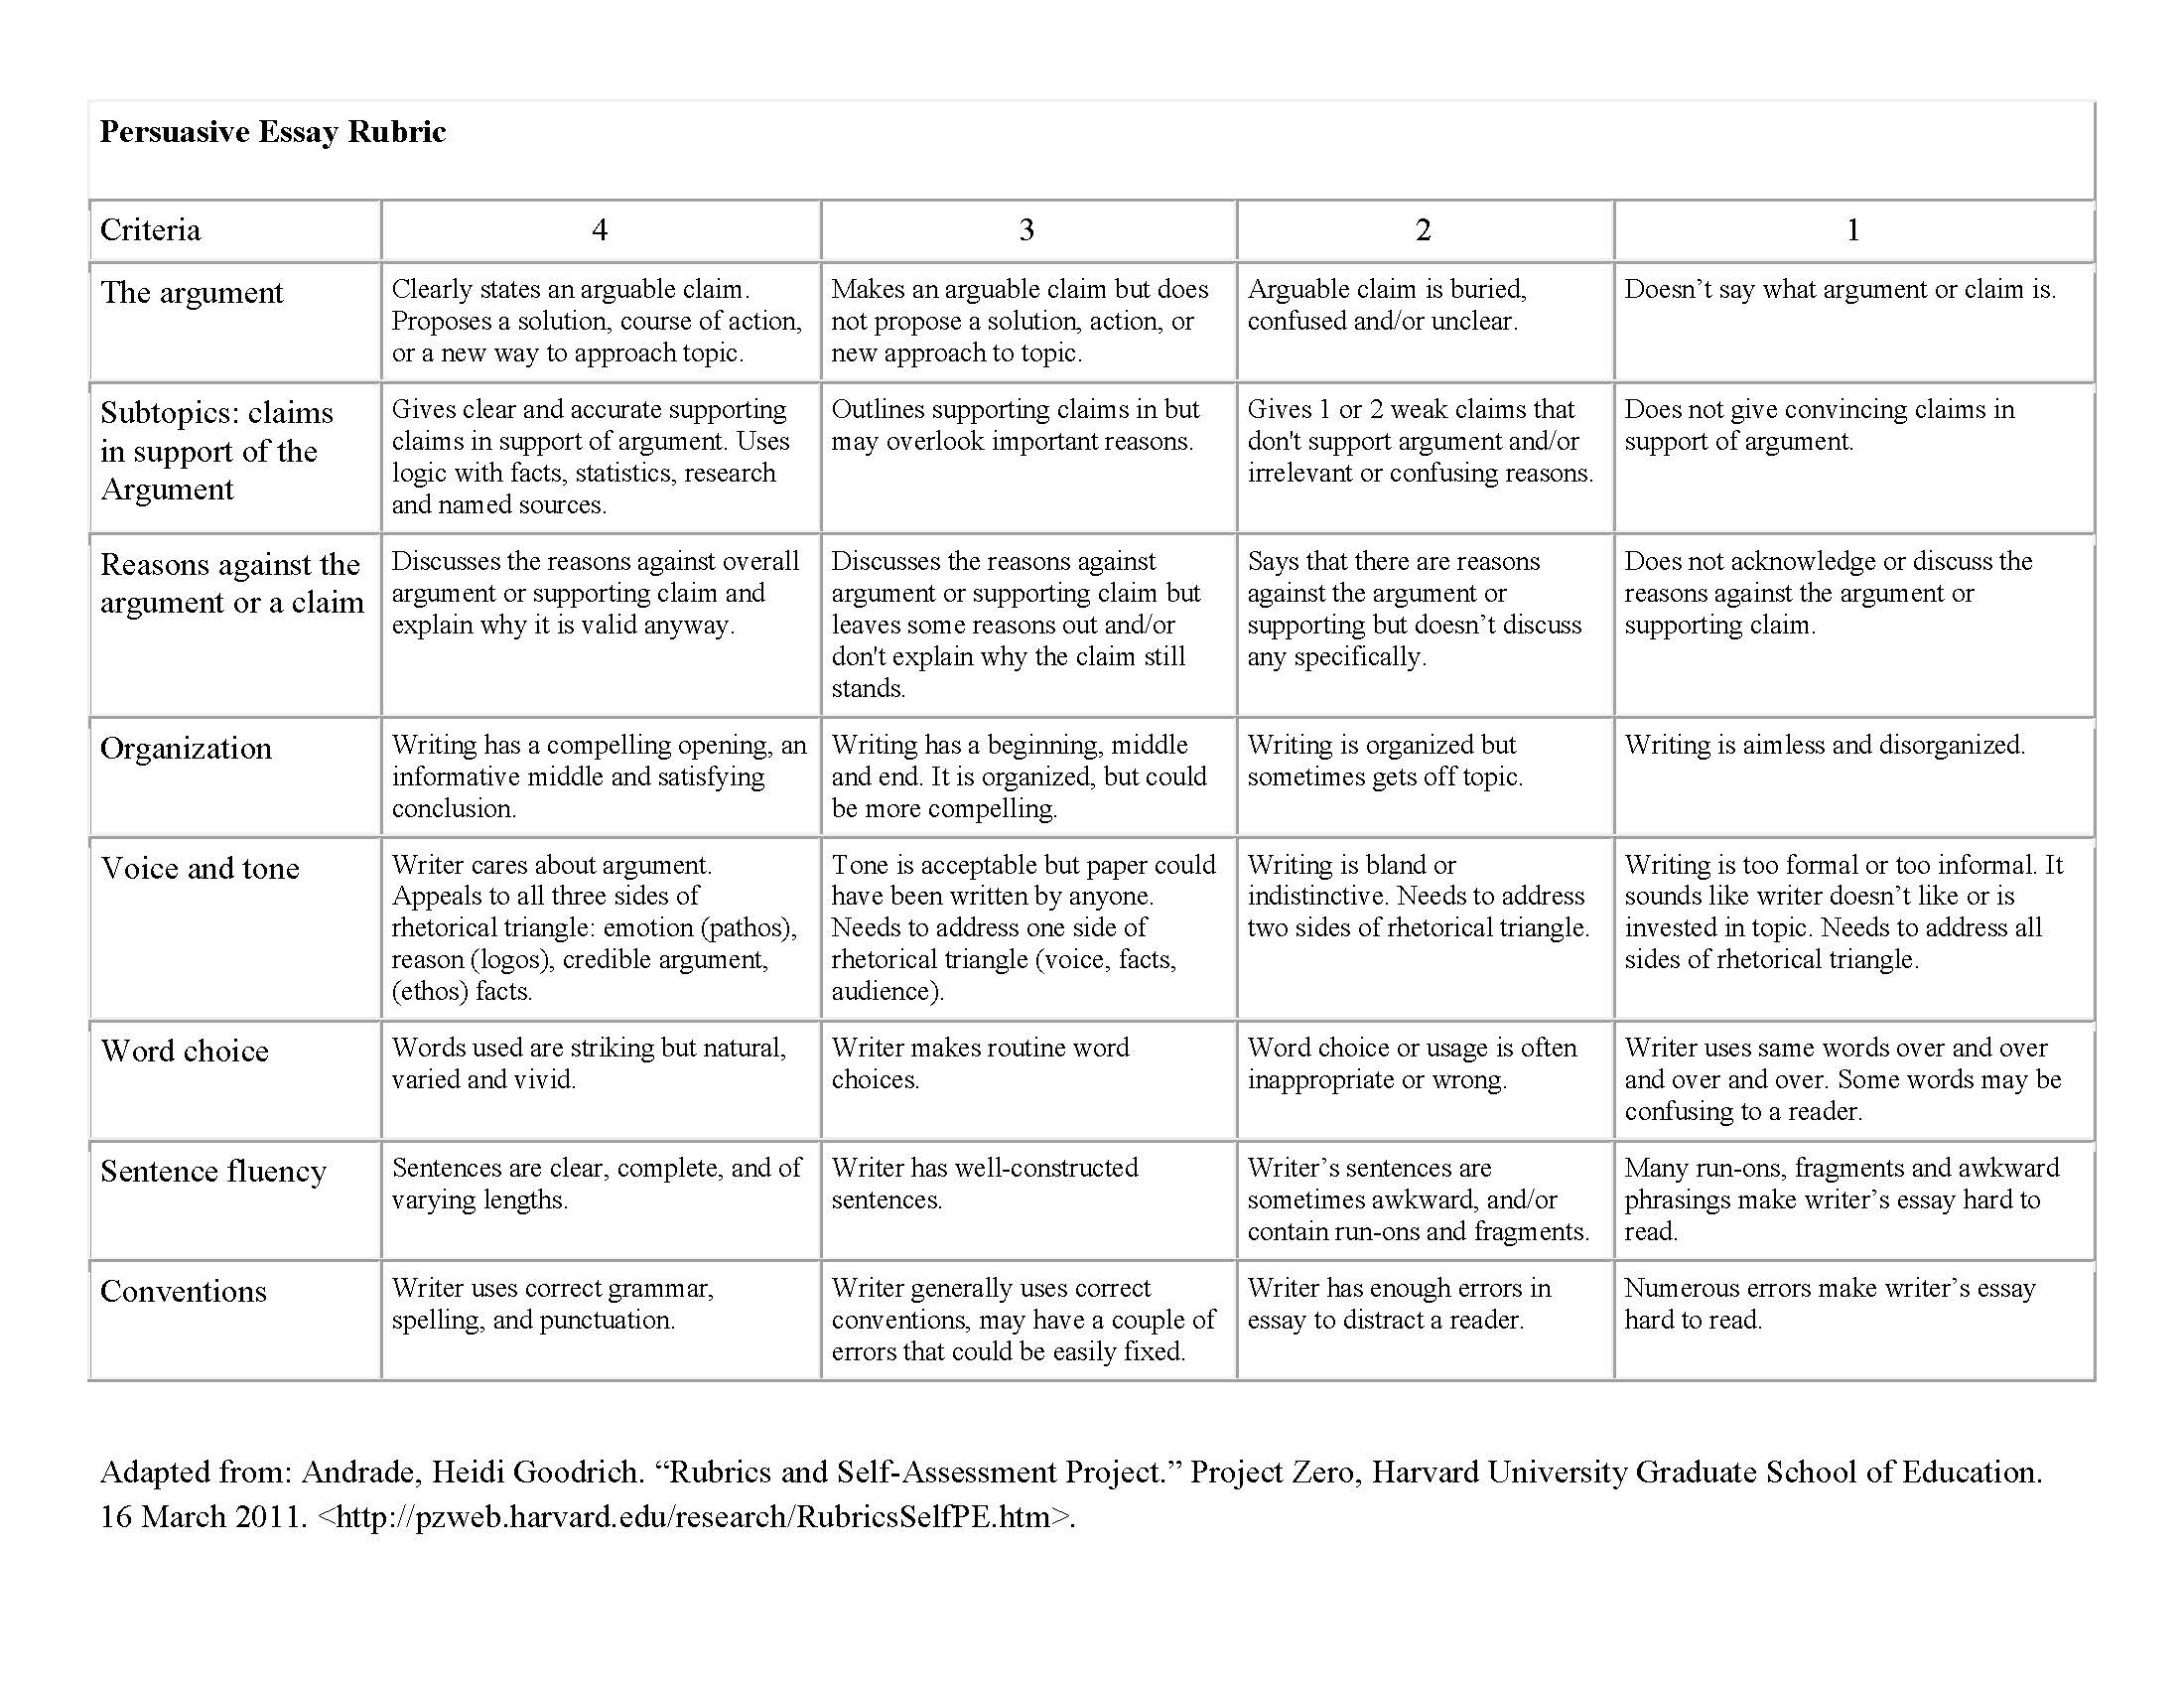 018 Handout Persuasive Essay Rubric Example Best Beautiful Topics Uk Argumentative For College Full